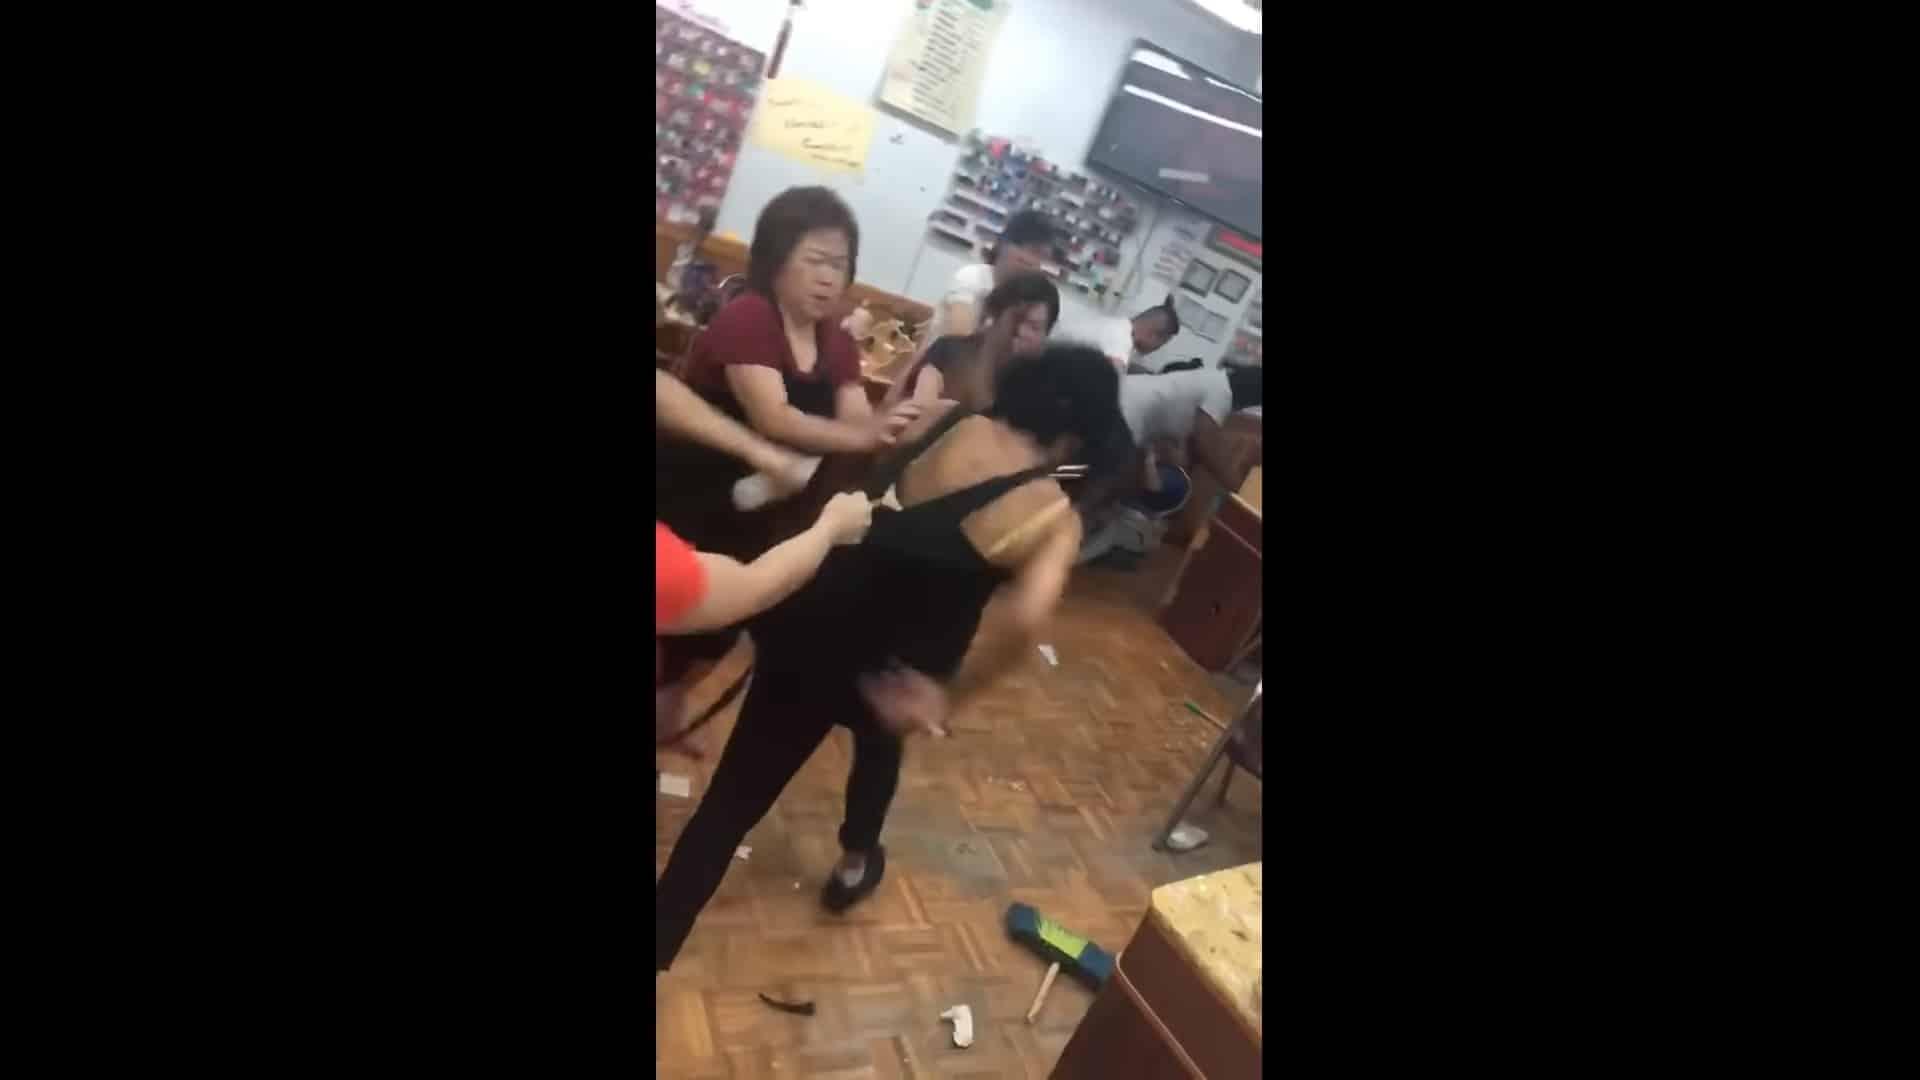 Botched 5 eyebrow wax sparks asian salon brawl in for Salon brawl